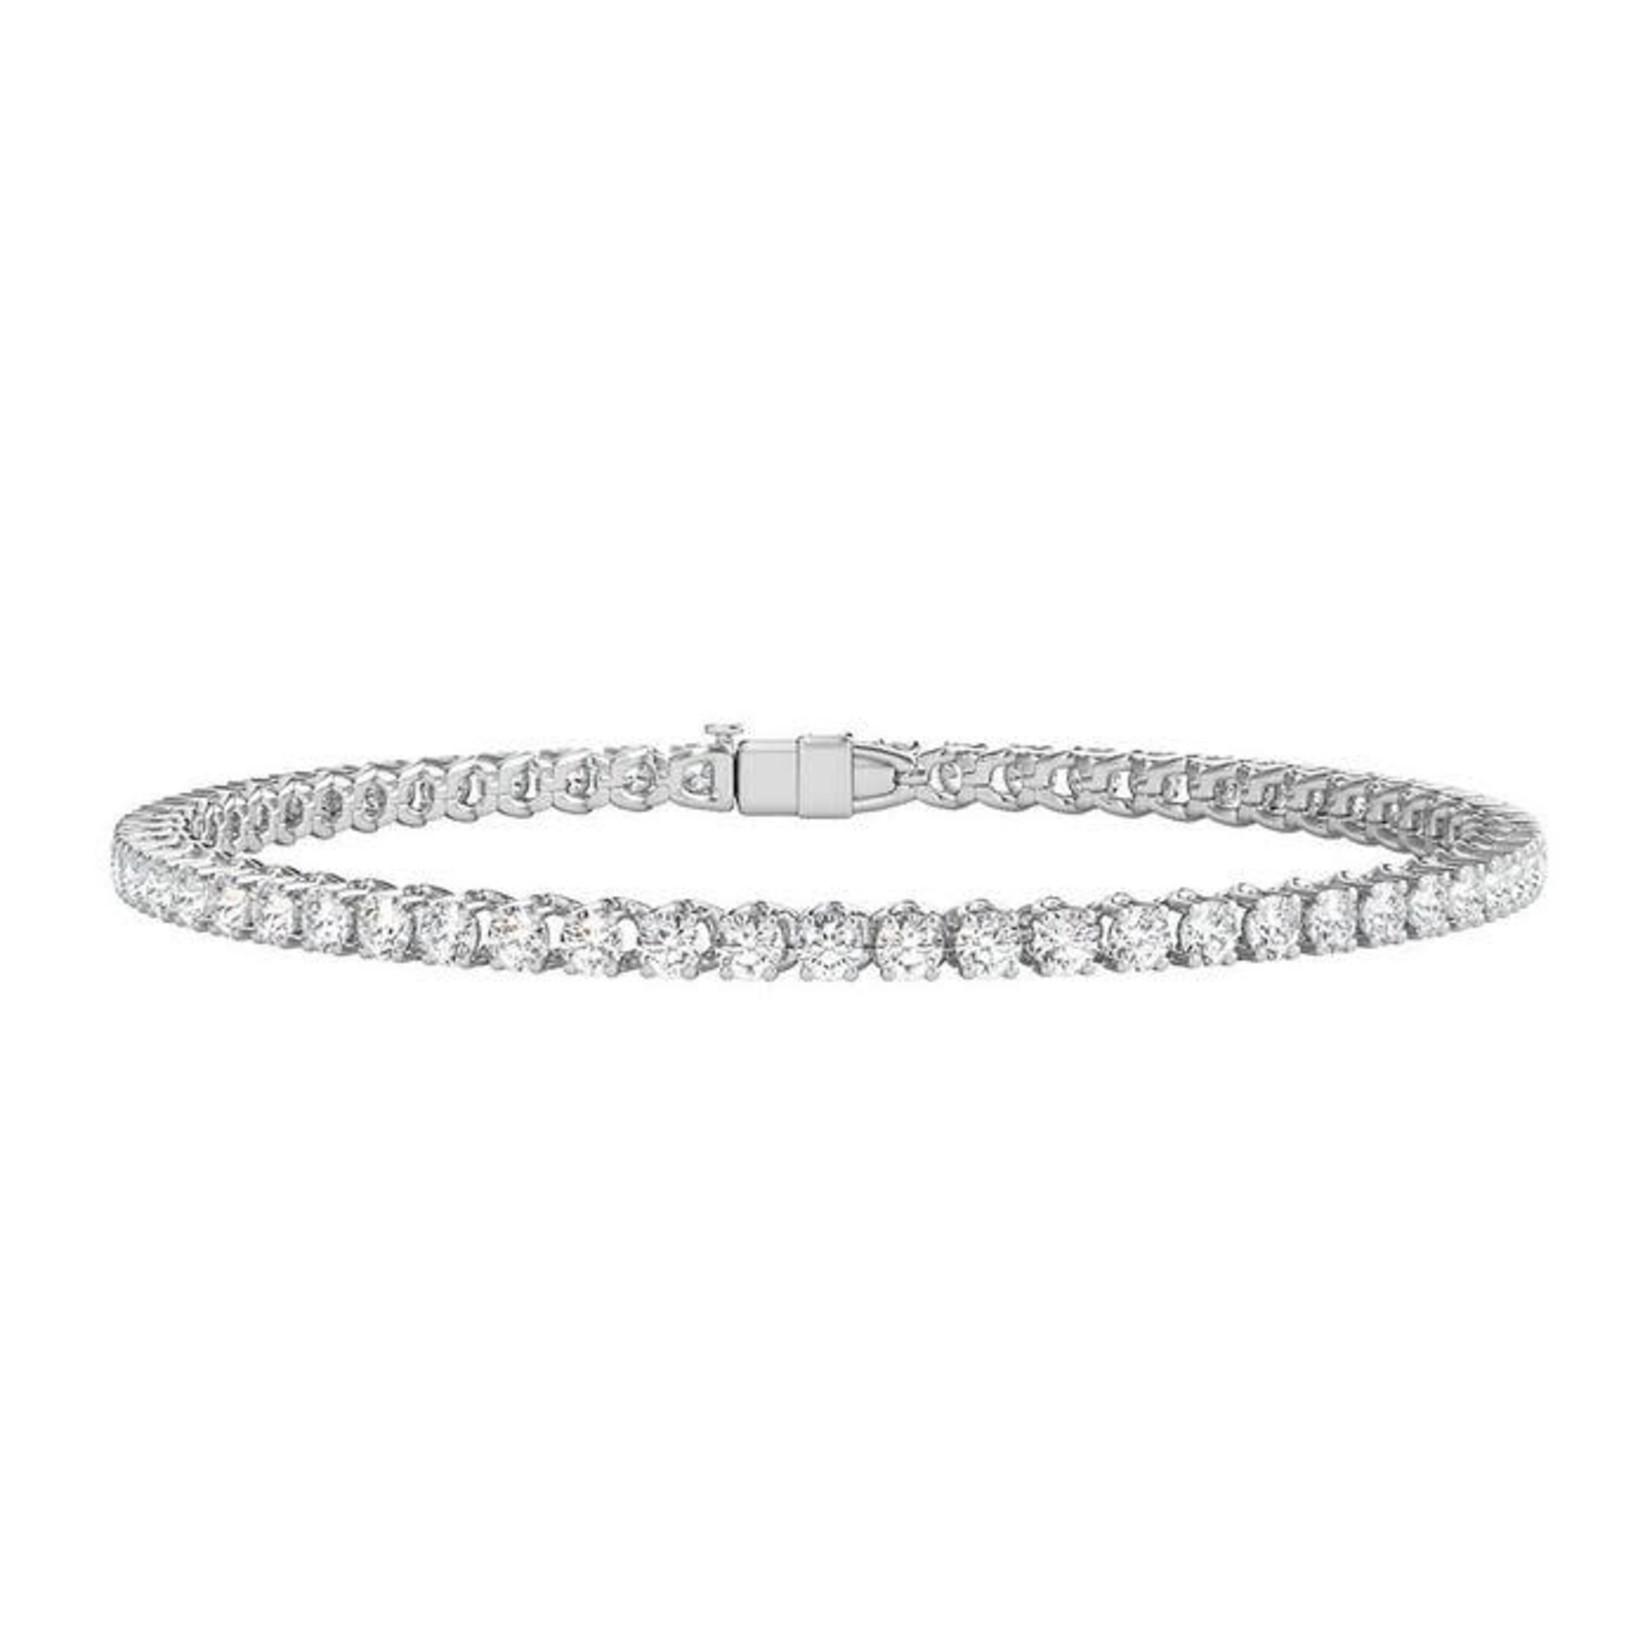 14KW Gold Diamond 4.25ctw Tennis Bracelet